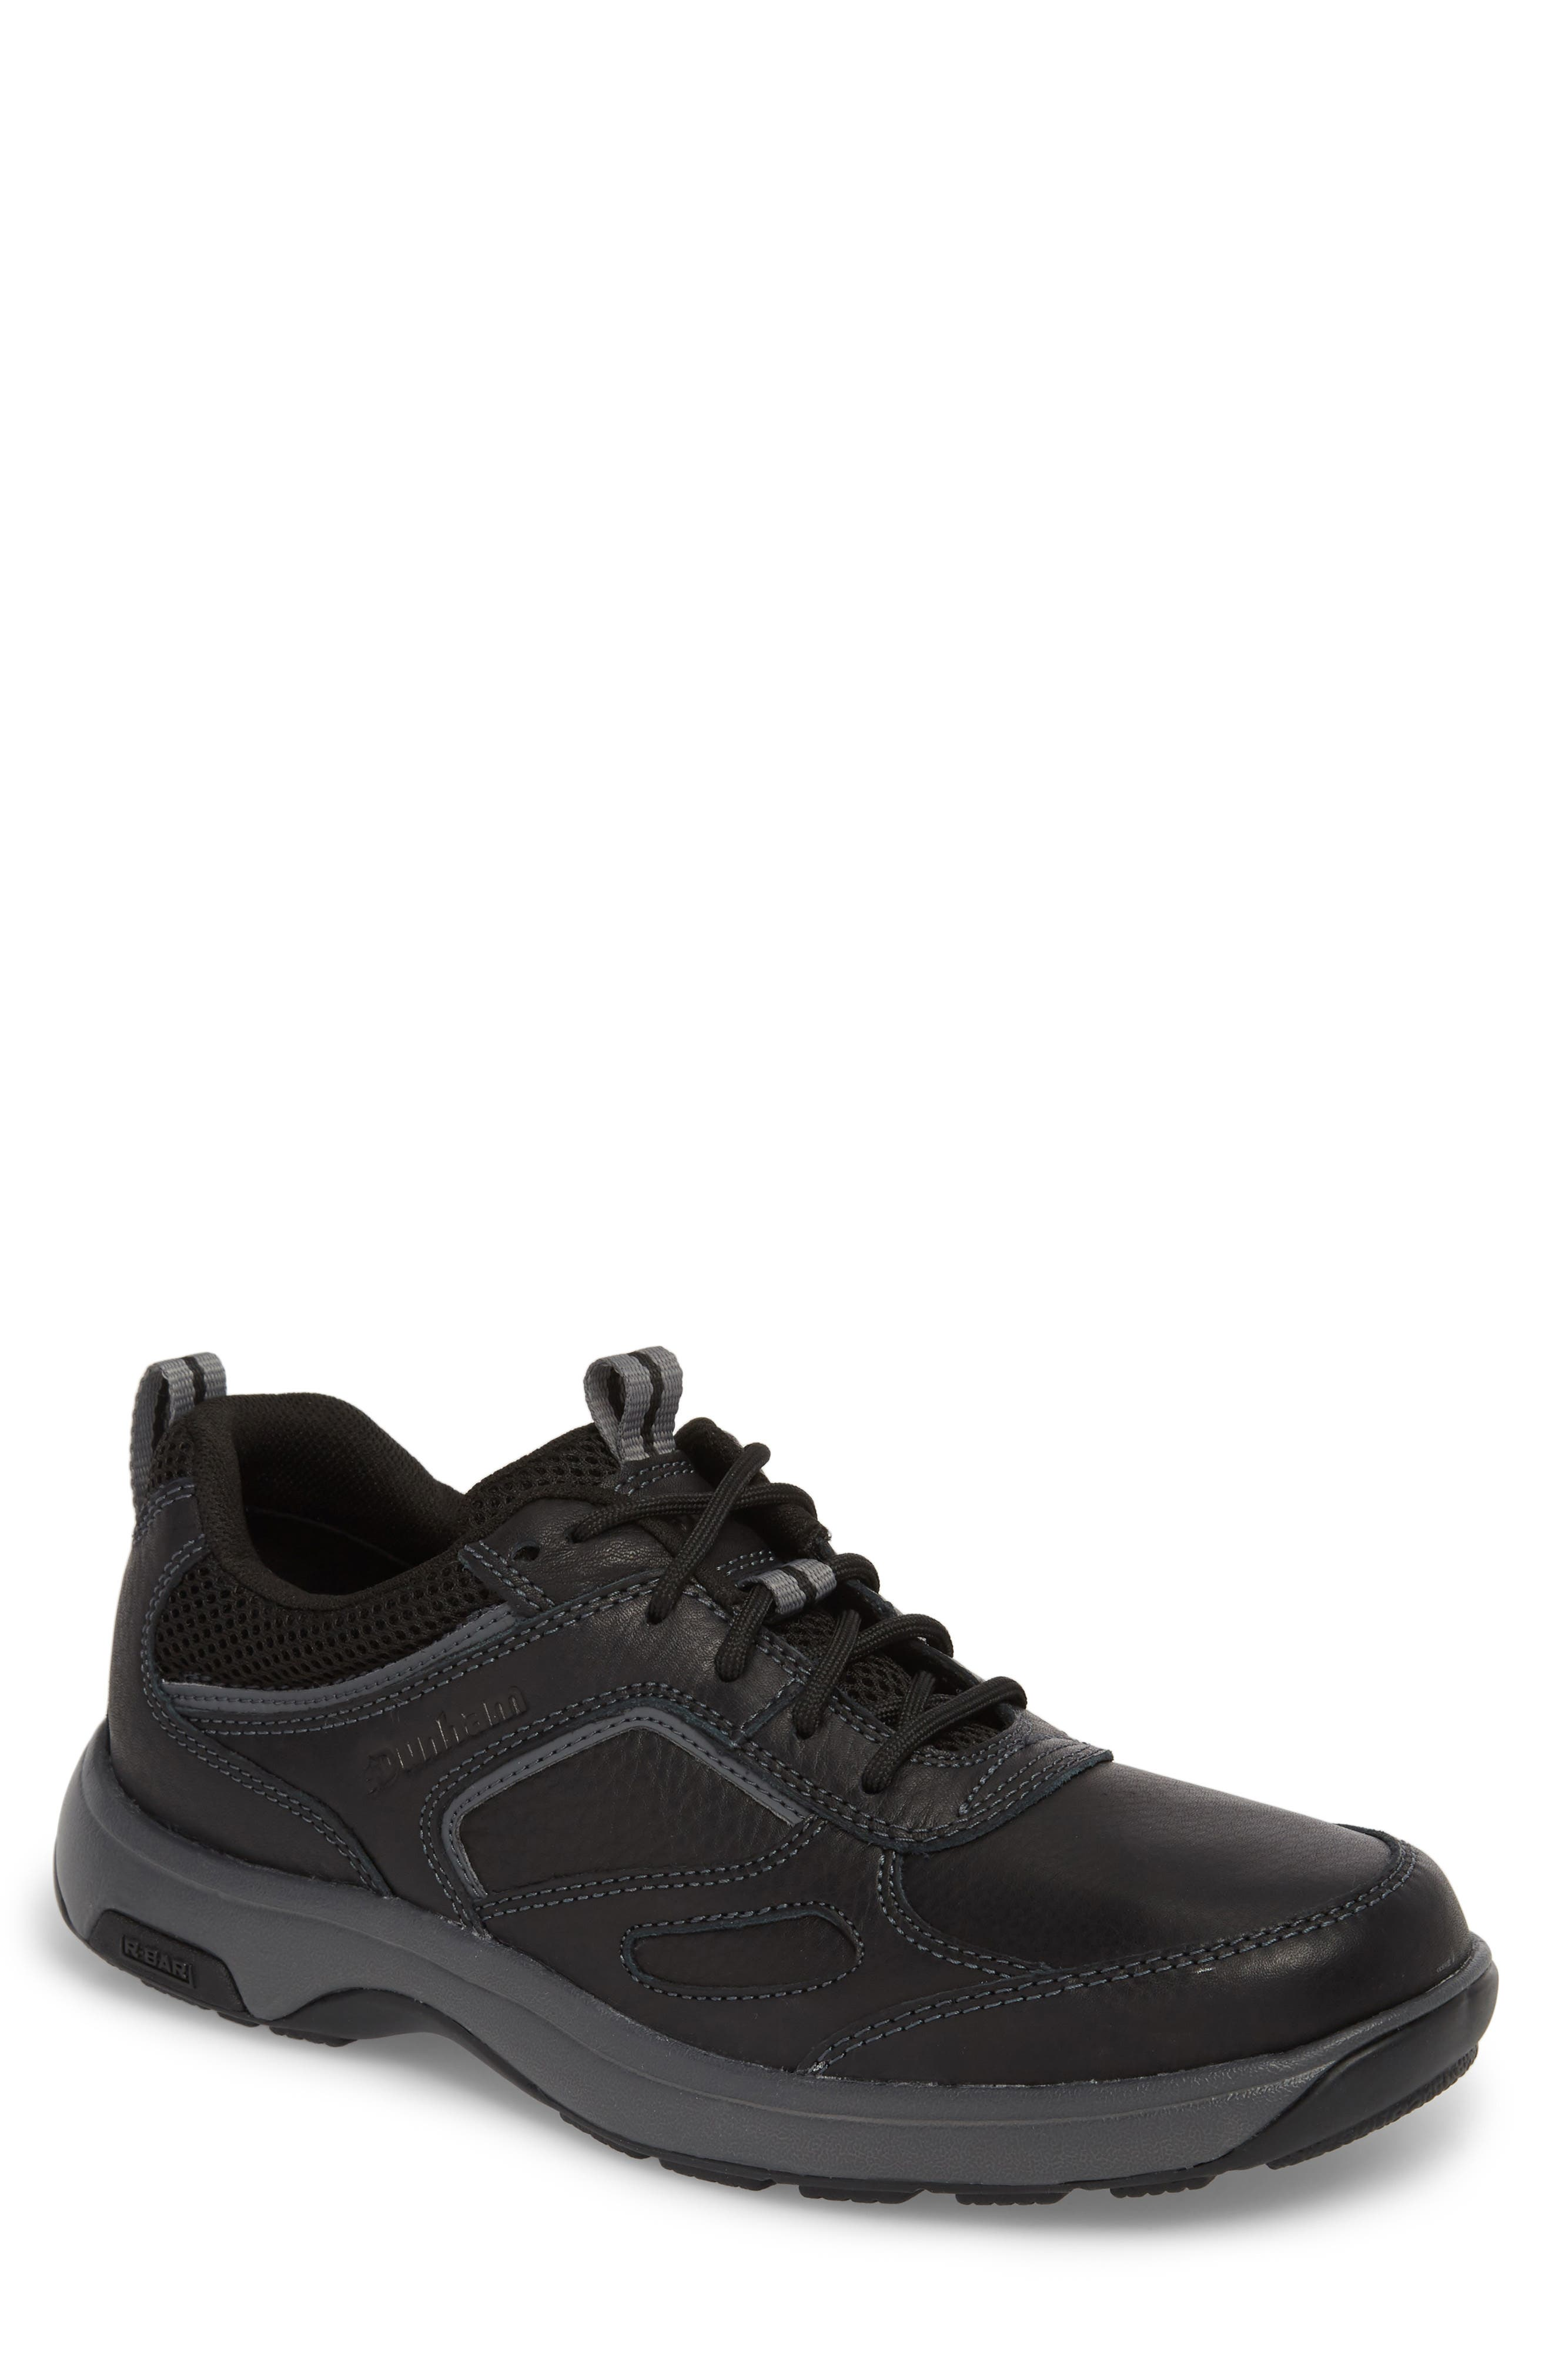 8000 Uball Sneaker,                         Main,                         color, 001